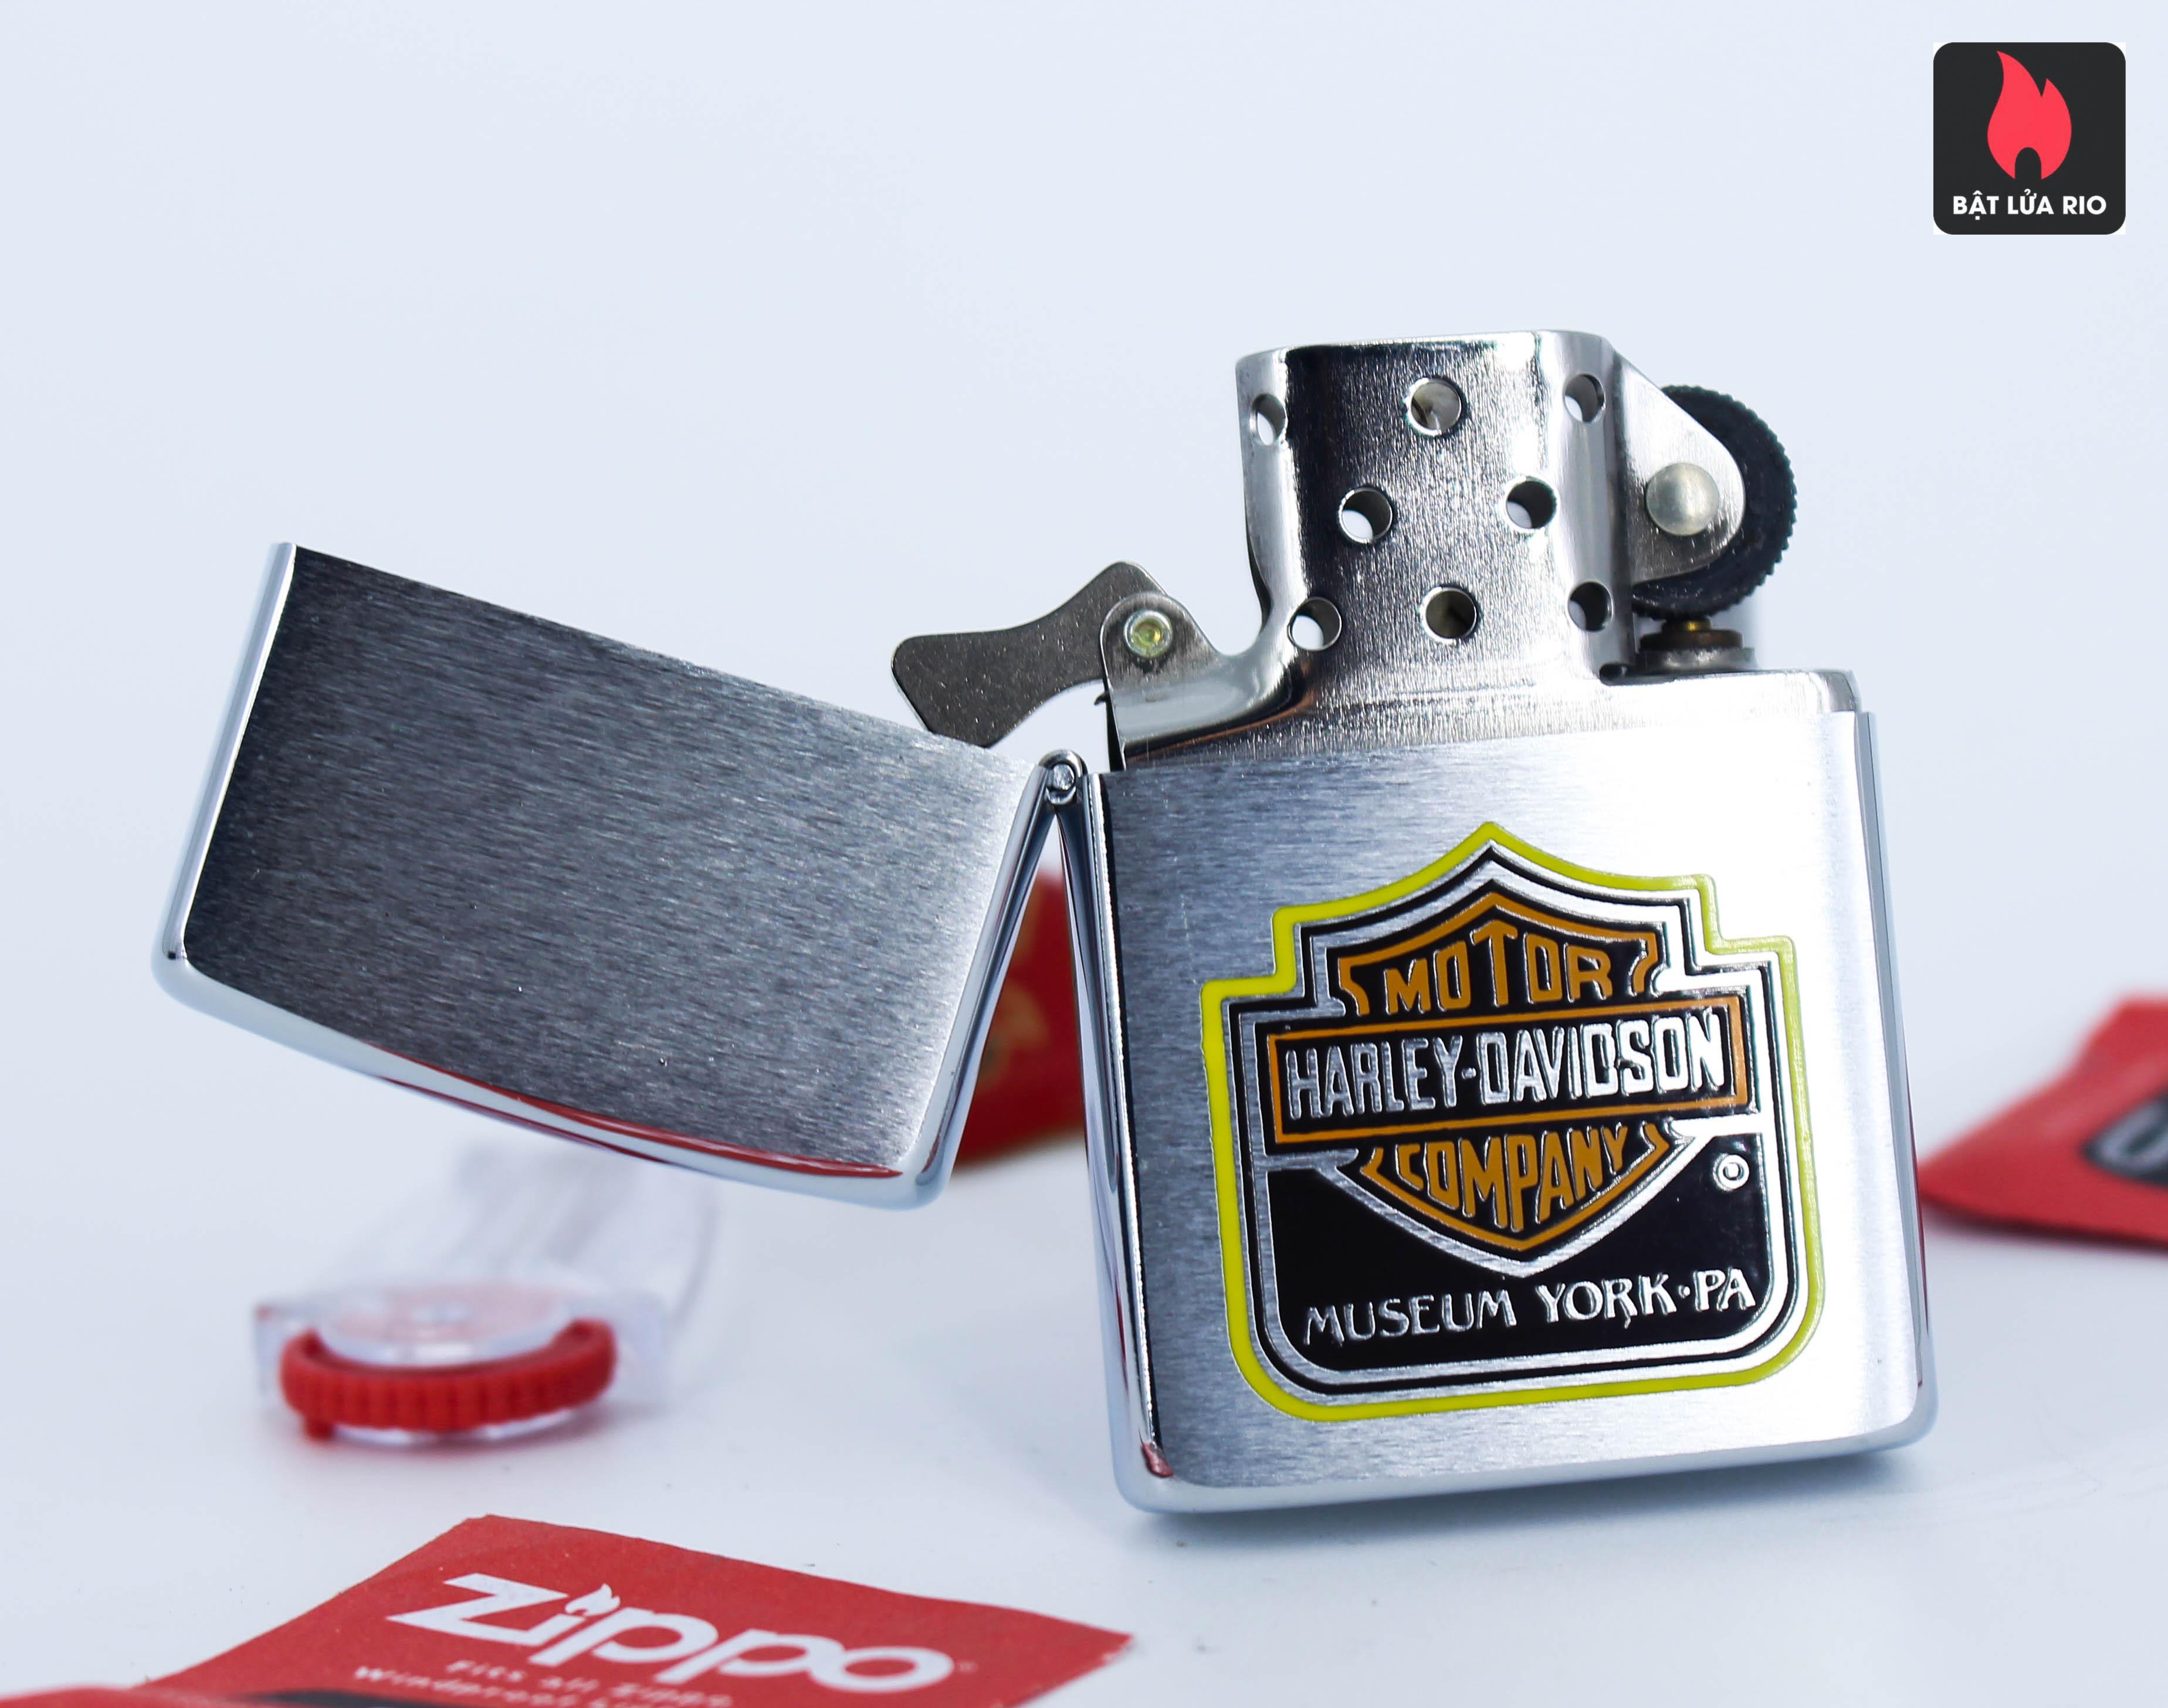 Zippo 1982 - Harley Davidson® – Museum York Pa 3